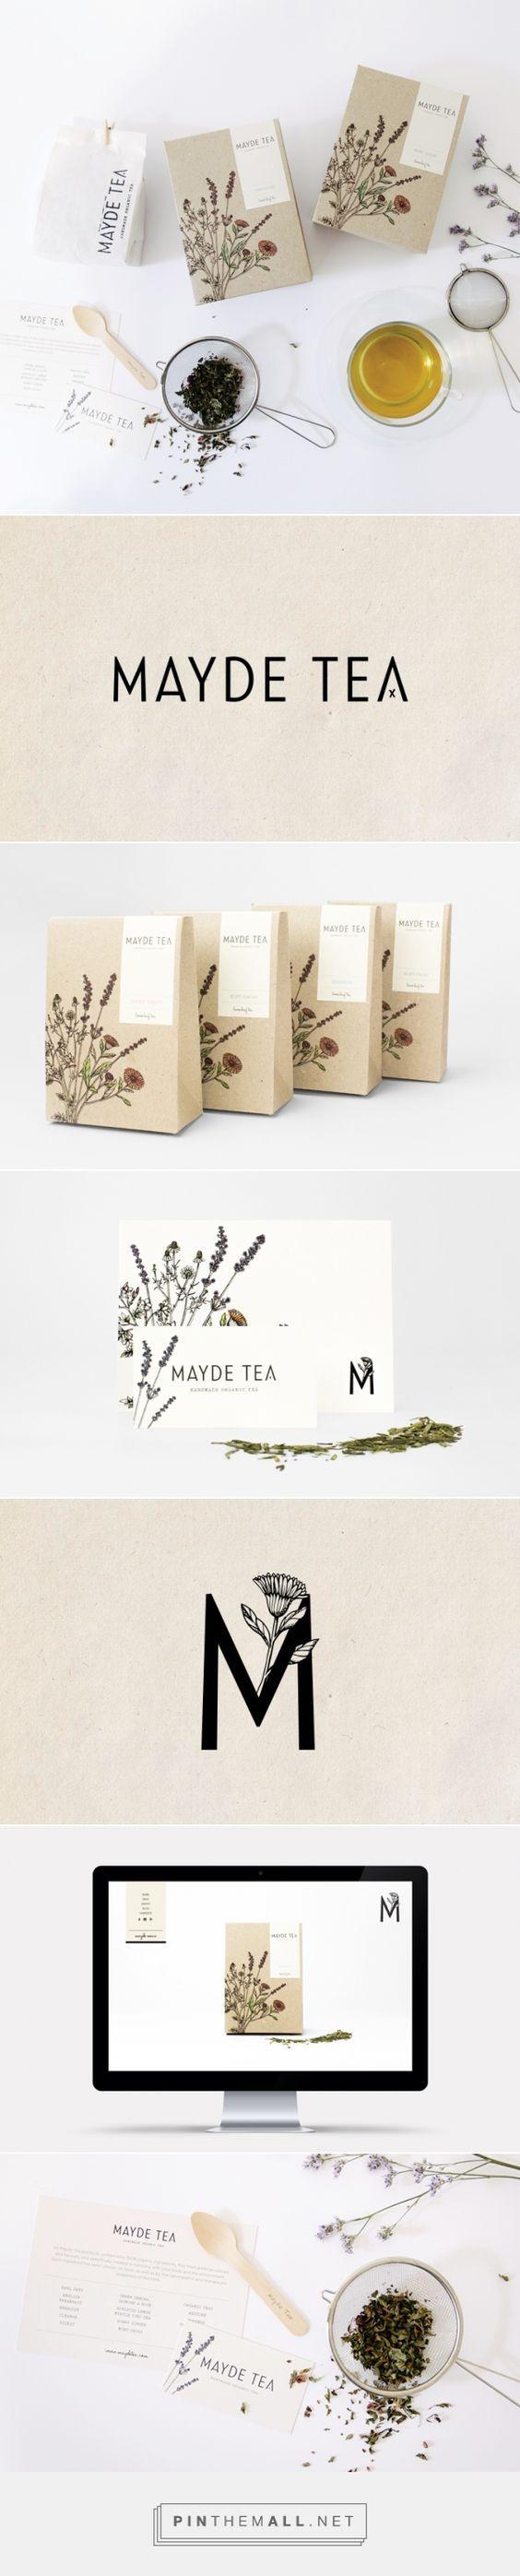 MAYDE Tea Branding and Packaging by Smack Bang Designs   Fivestar Branding – Design and Branding Agency & Inspiration Gallery